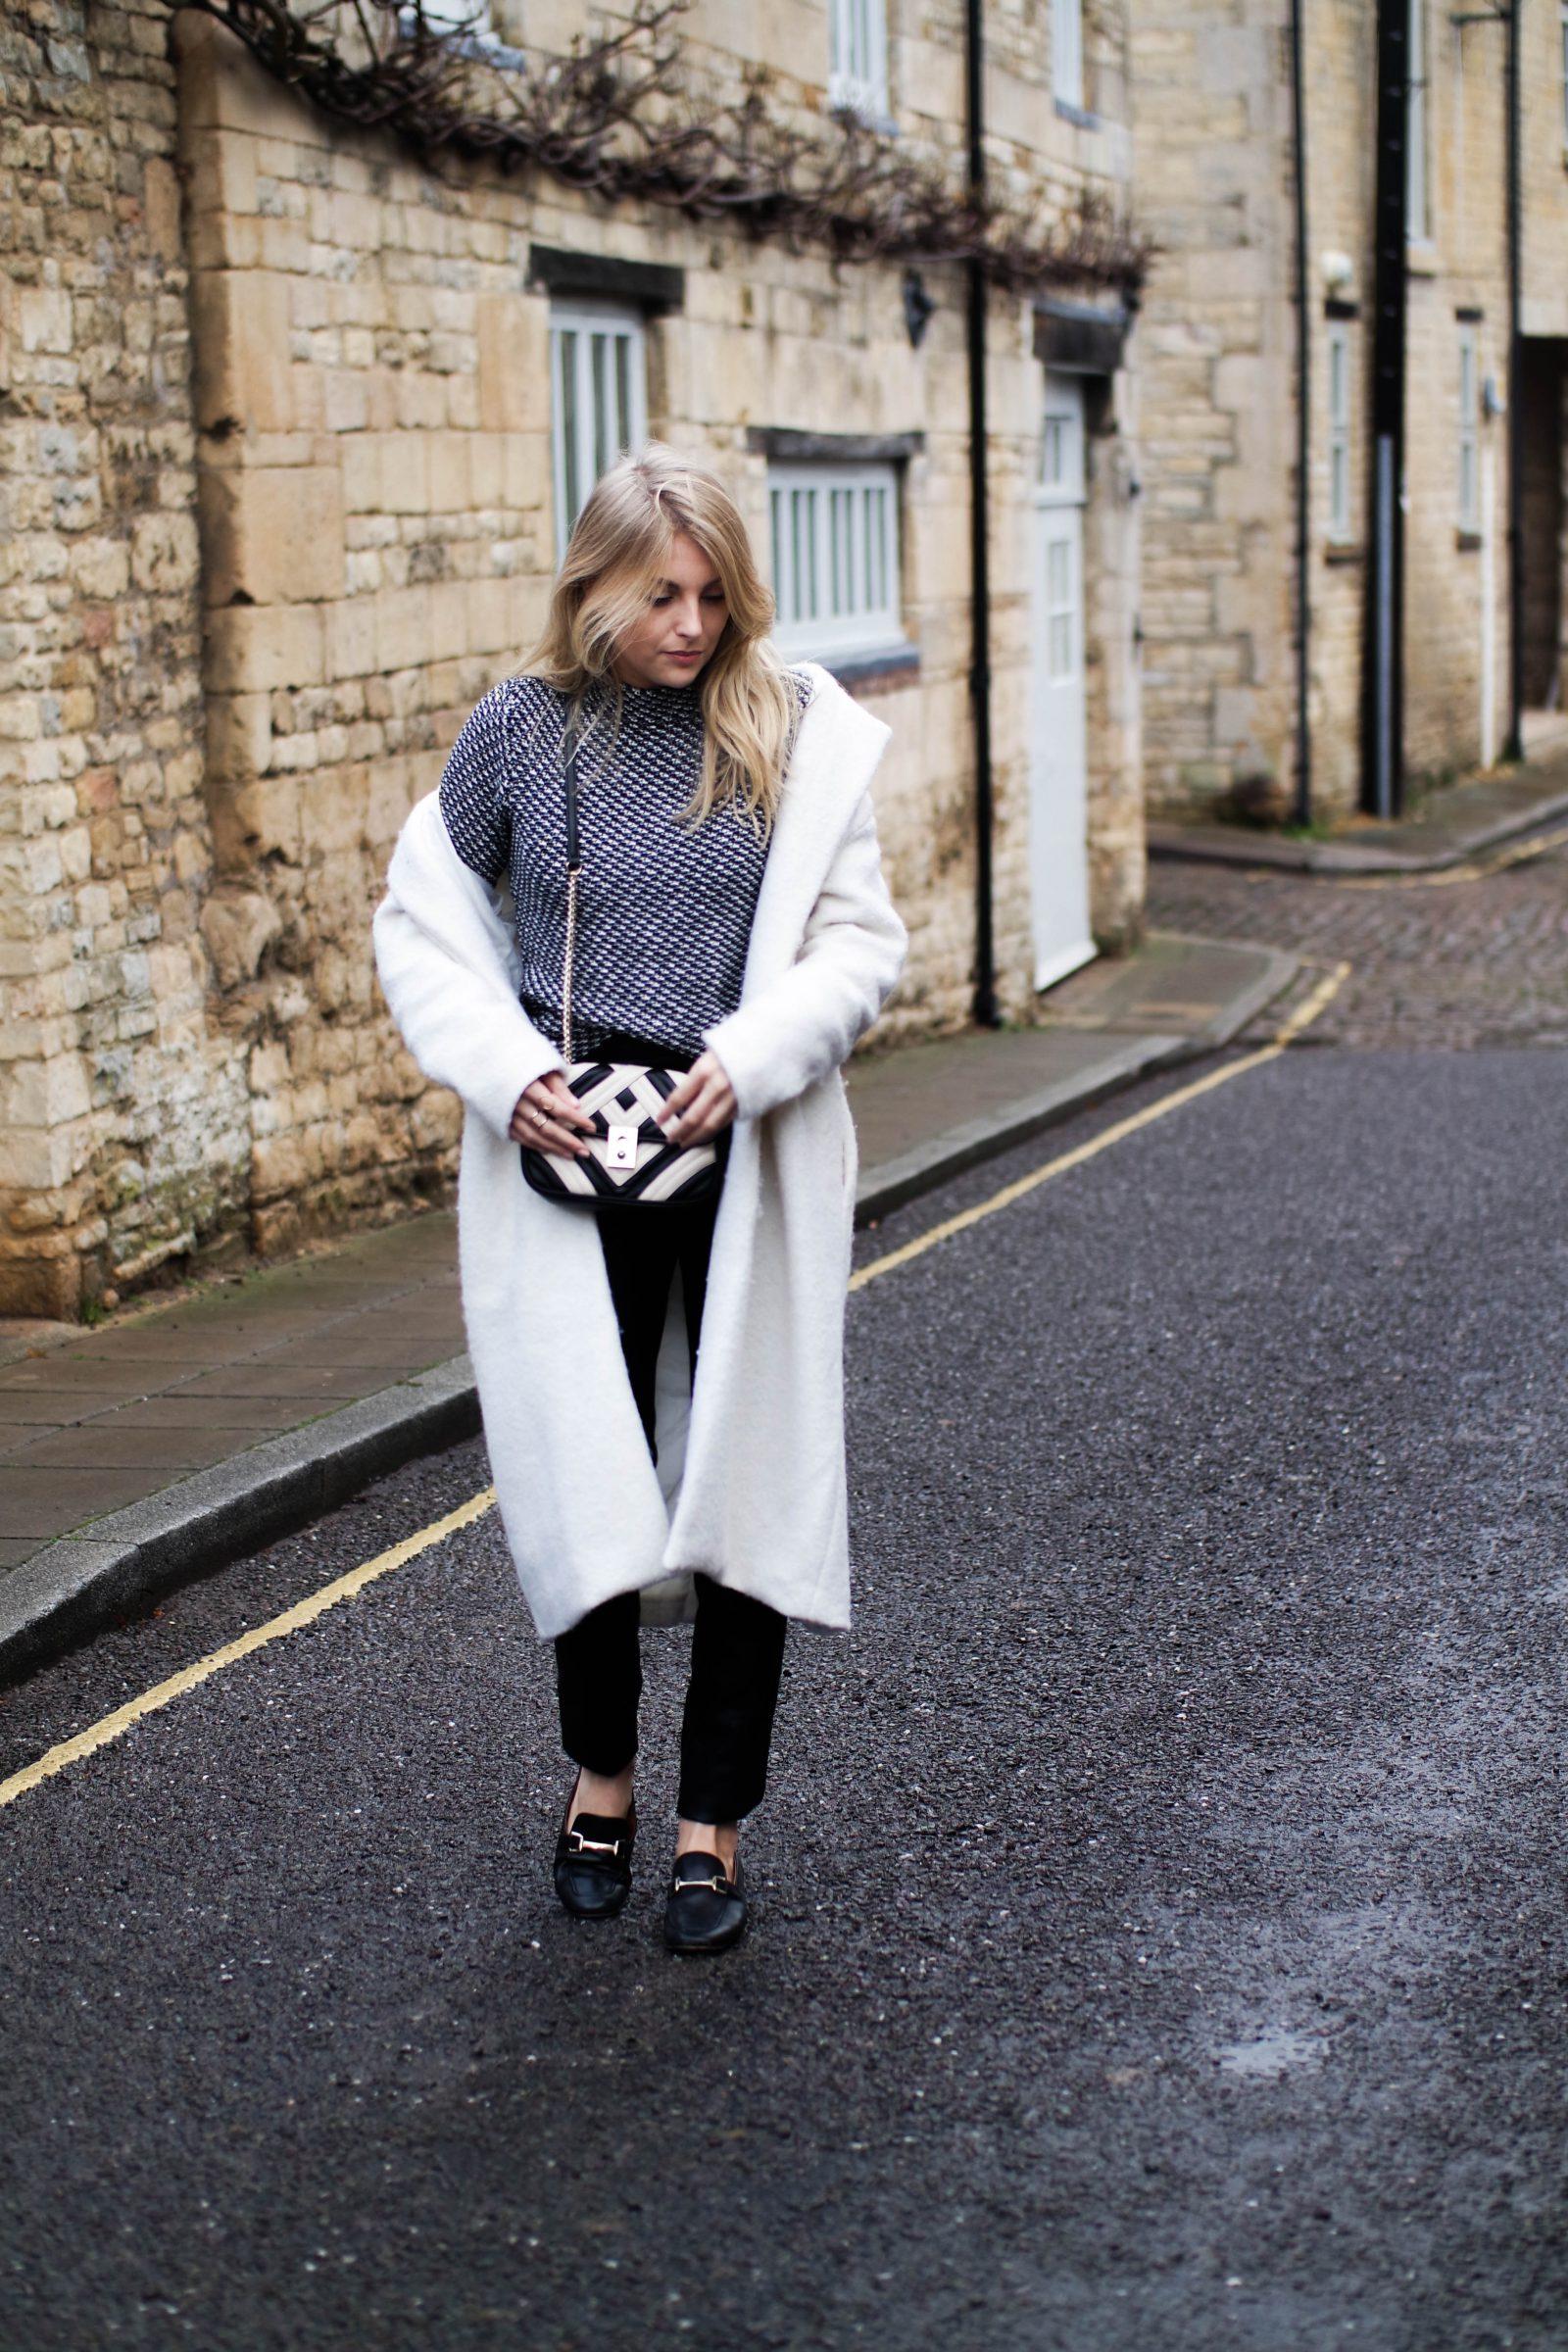 Monochrome 2 Ways With-Laura Ashley Fashion Blogger Style